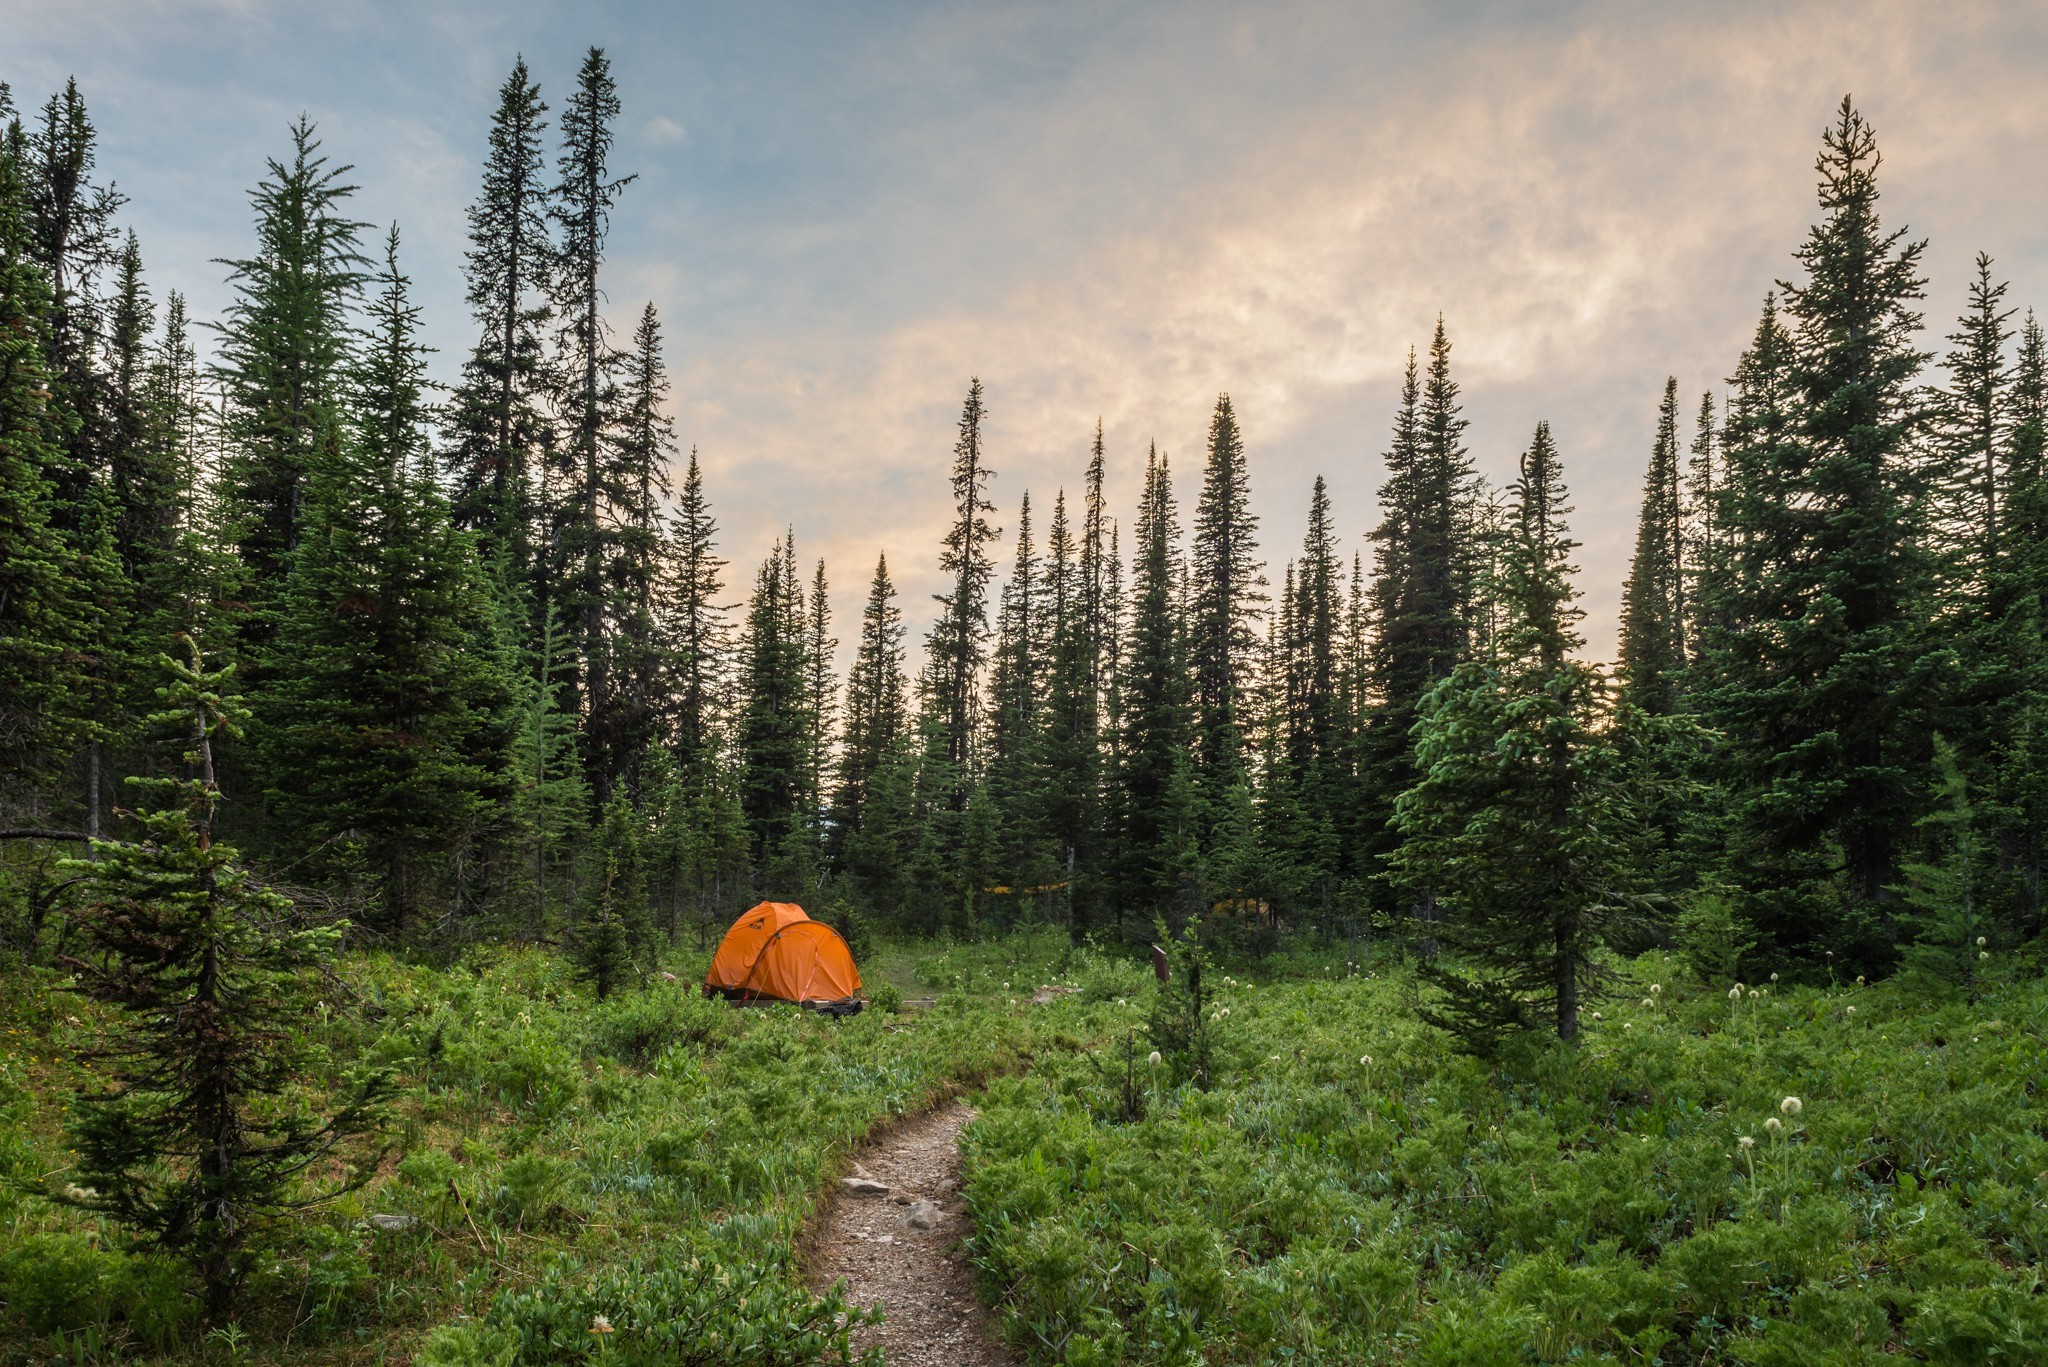 camping-wallpaper-7